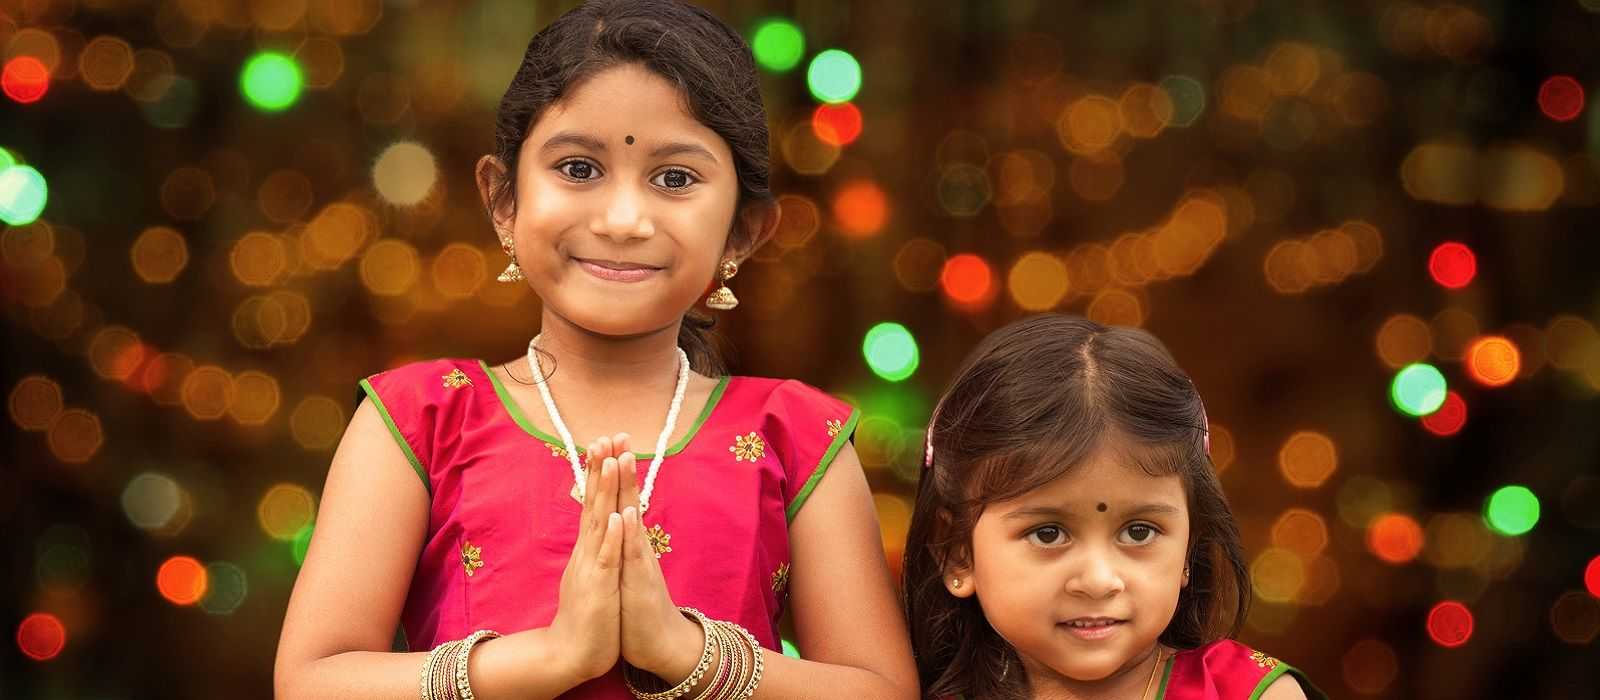 Festival Fever: Diwali in India Tour Trip 1